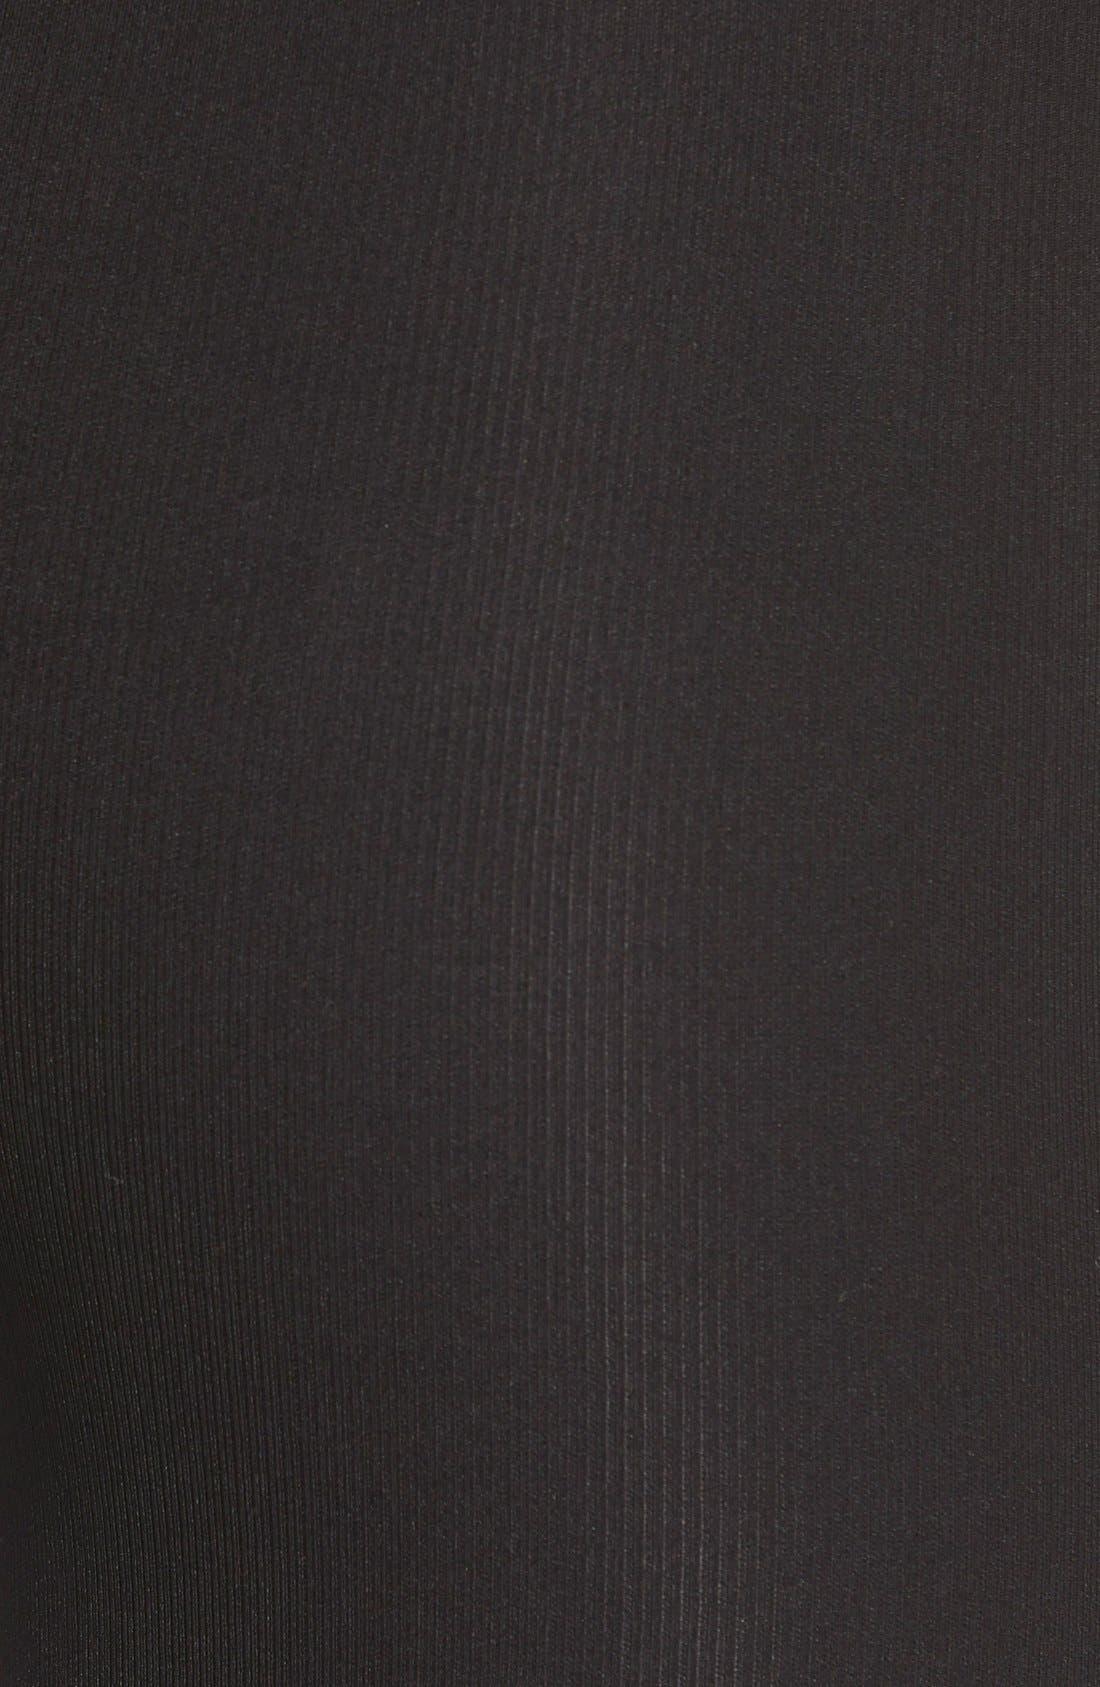 Faux Fur Lined Leggings,                             Alternate thumbnail 5, color,                             001